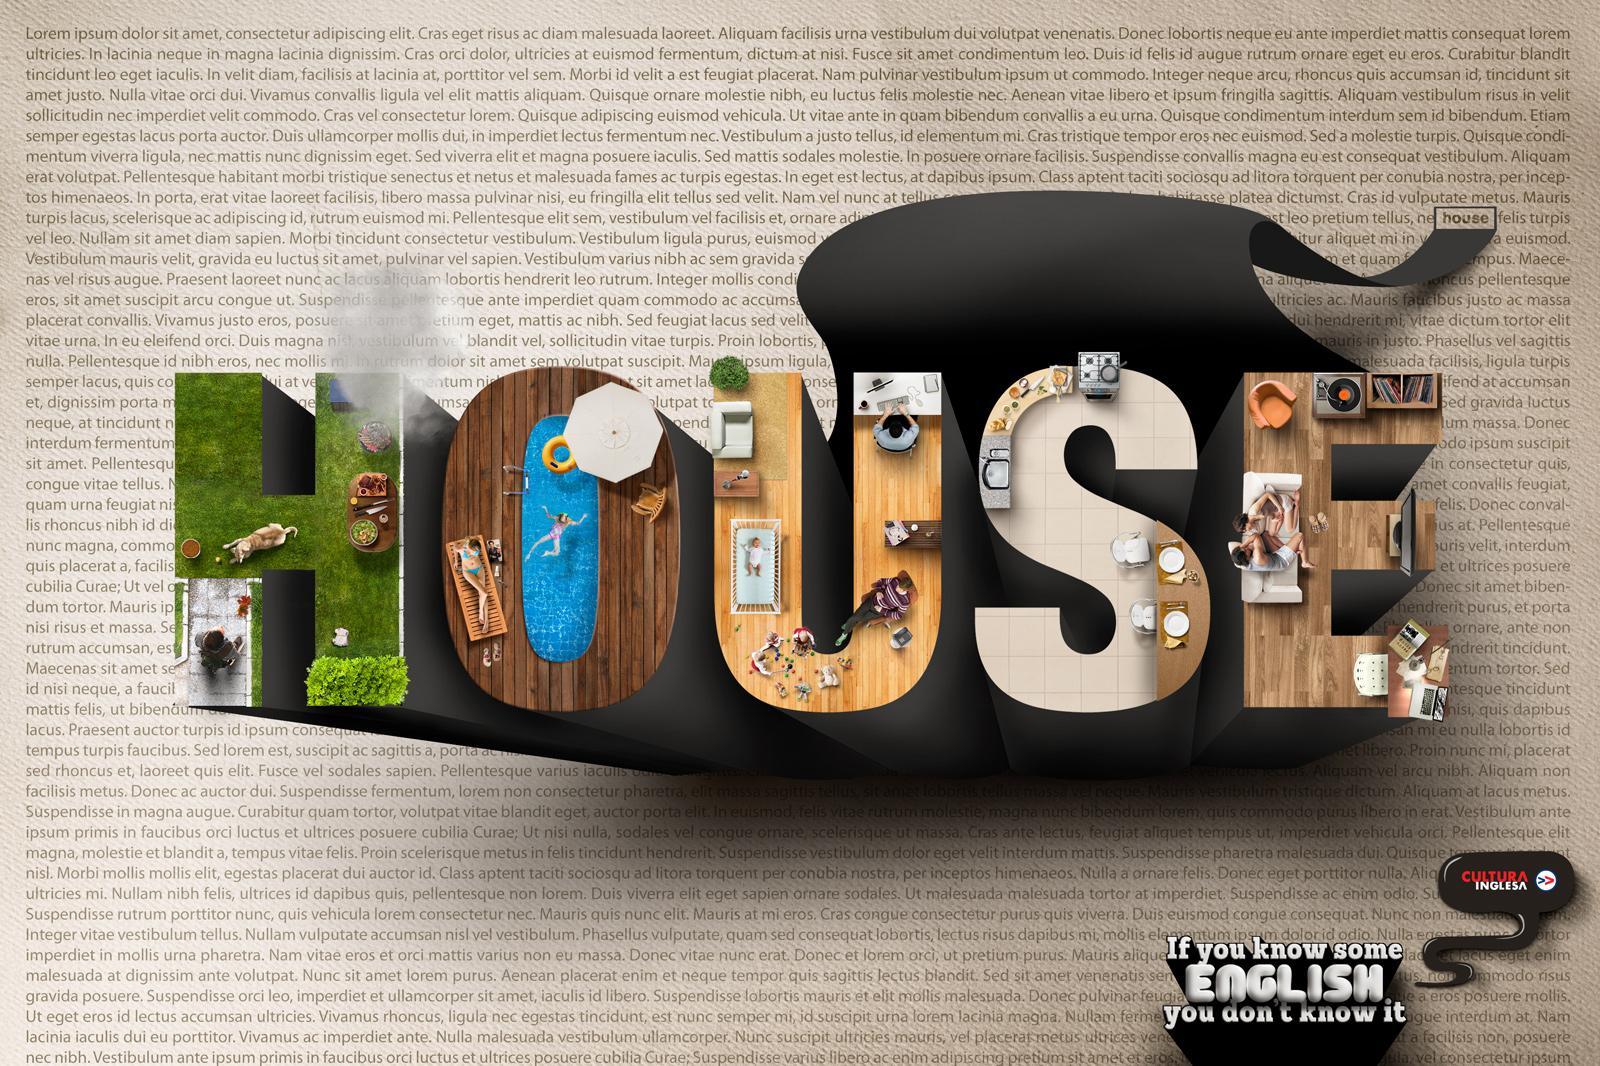 Merveilleux Cultura Inglesa Print Ad   House